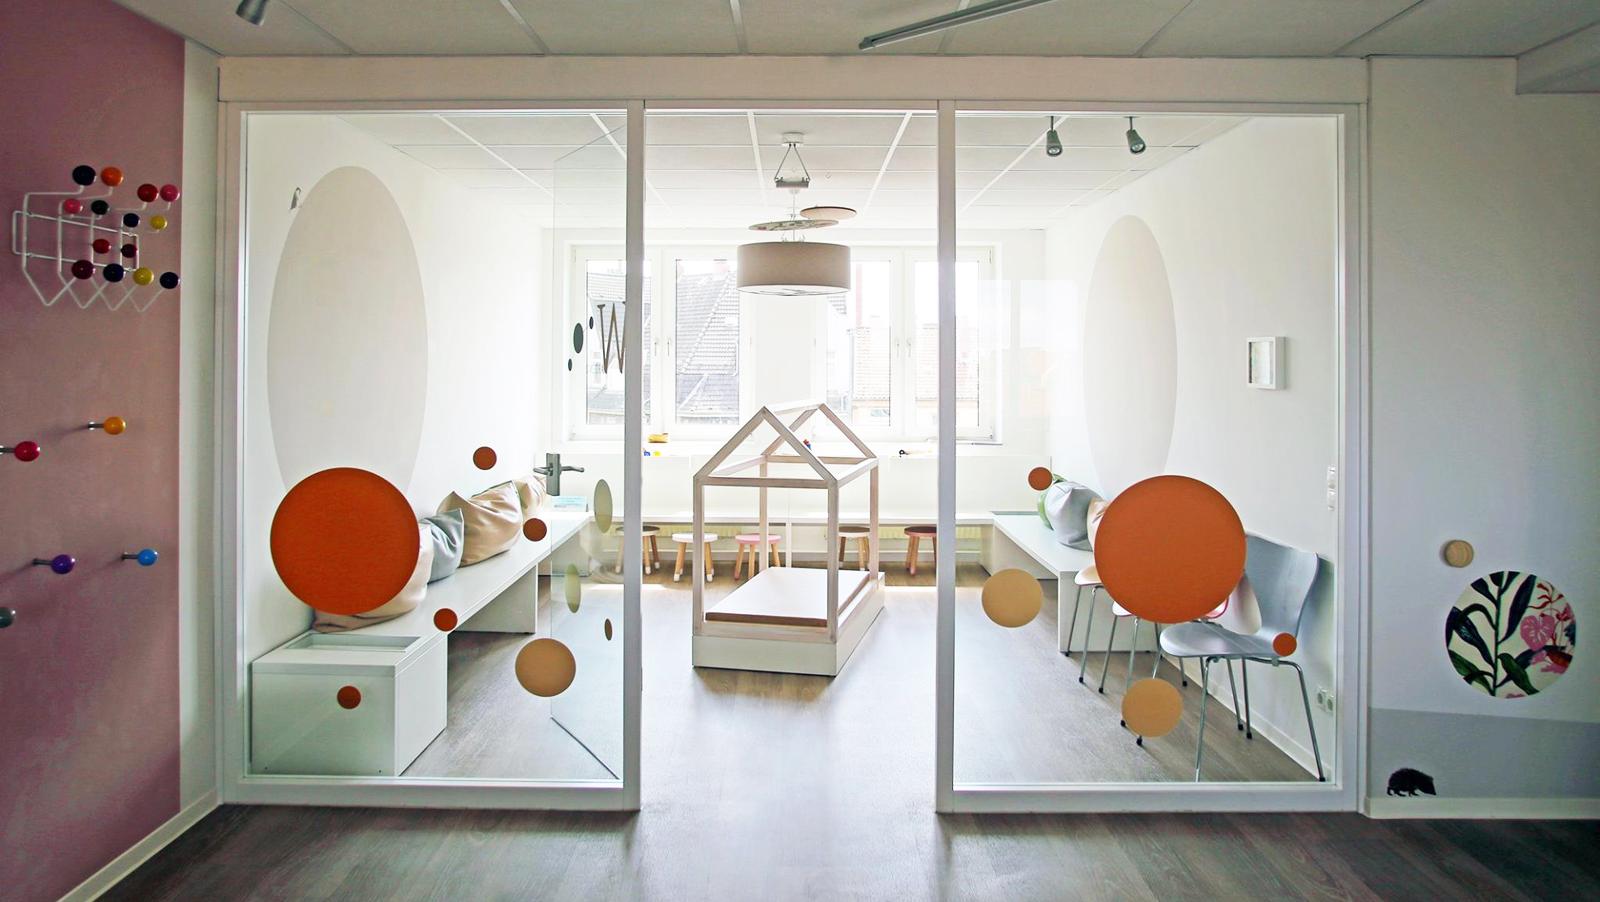 Raumgestaltung kinderzimmer kindergarten stuttgart for Raumgestaltung app